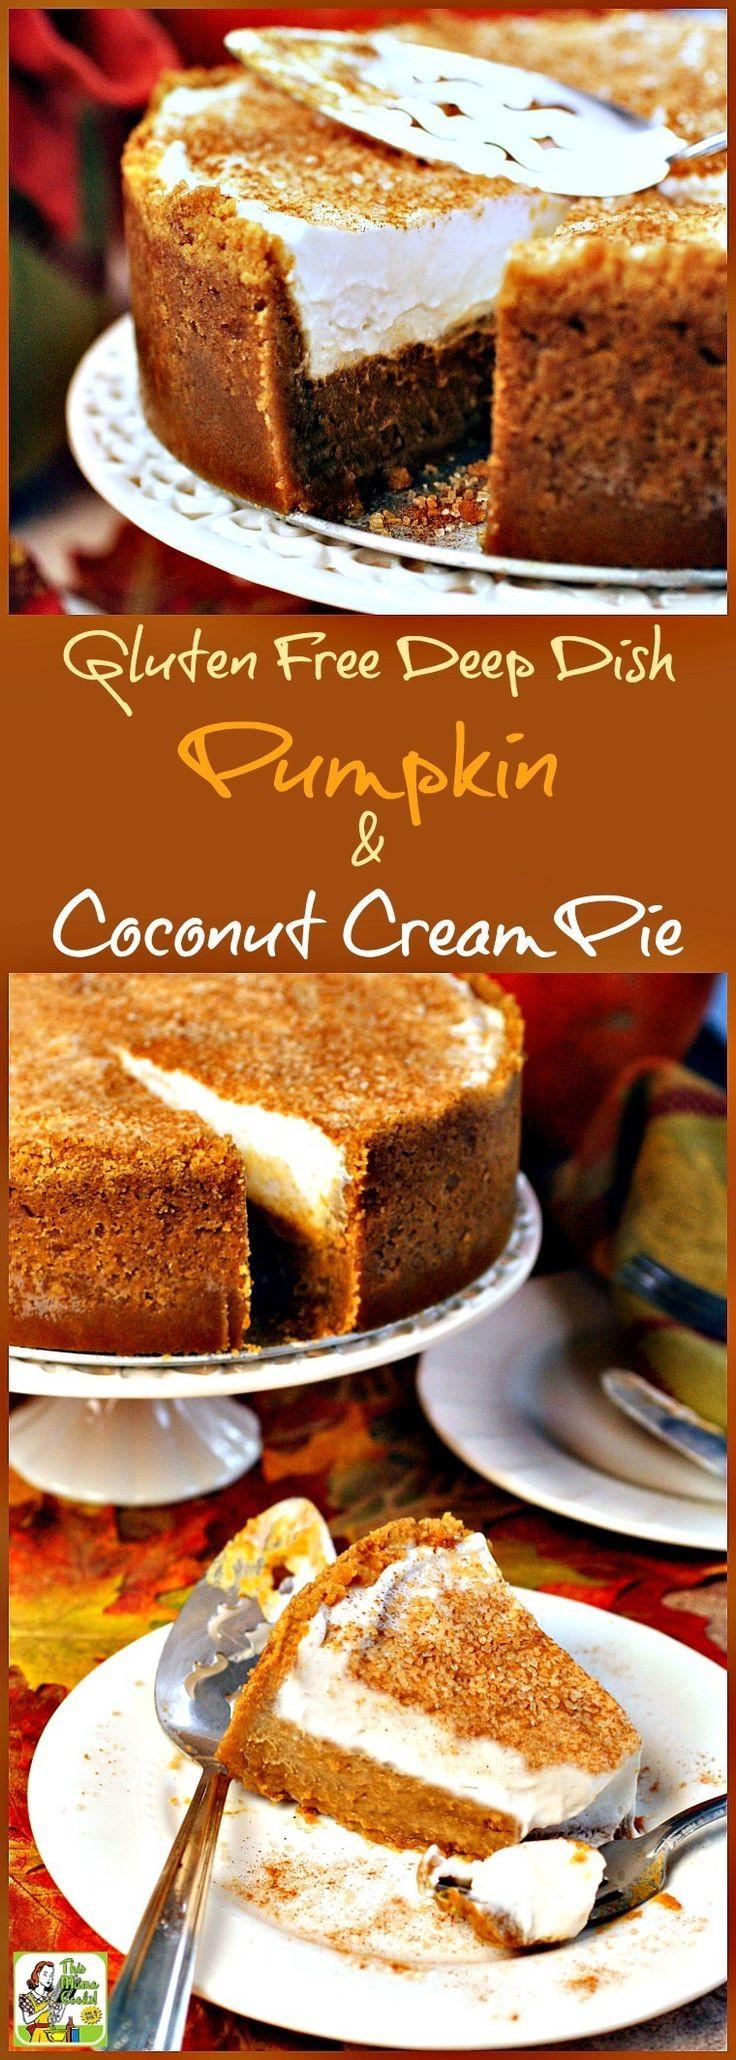 Dairy Free Pumpkin Recipes  Not only is this pumpkin dessert recipe gluten free and